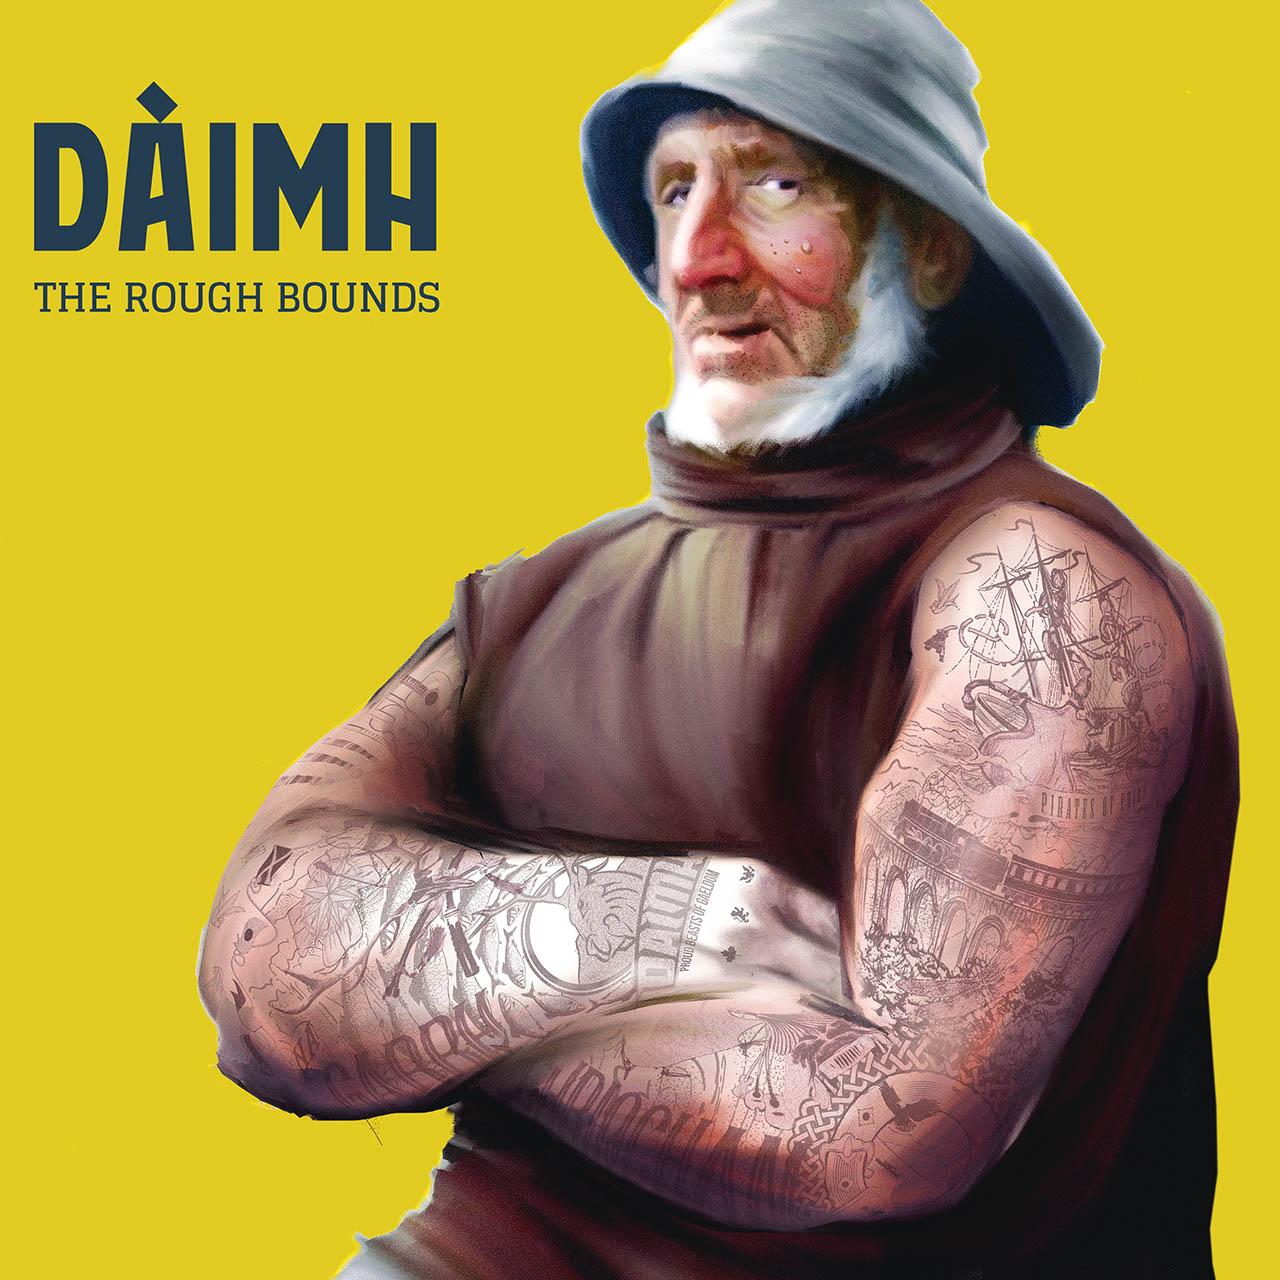 Dàimh - The Rough Bounds